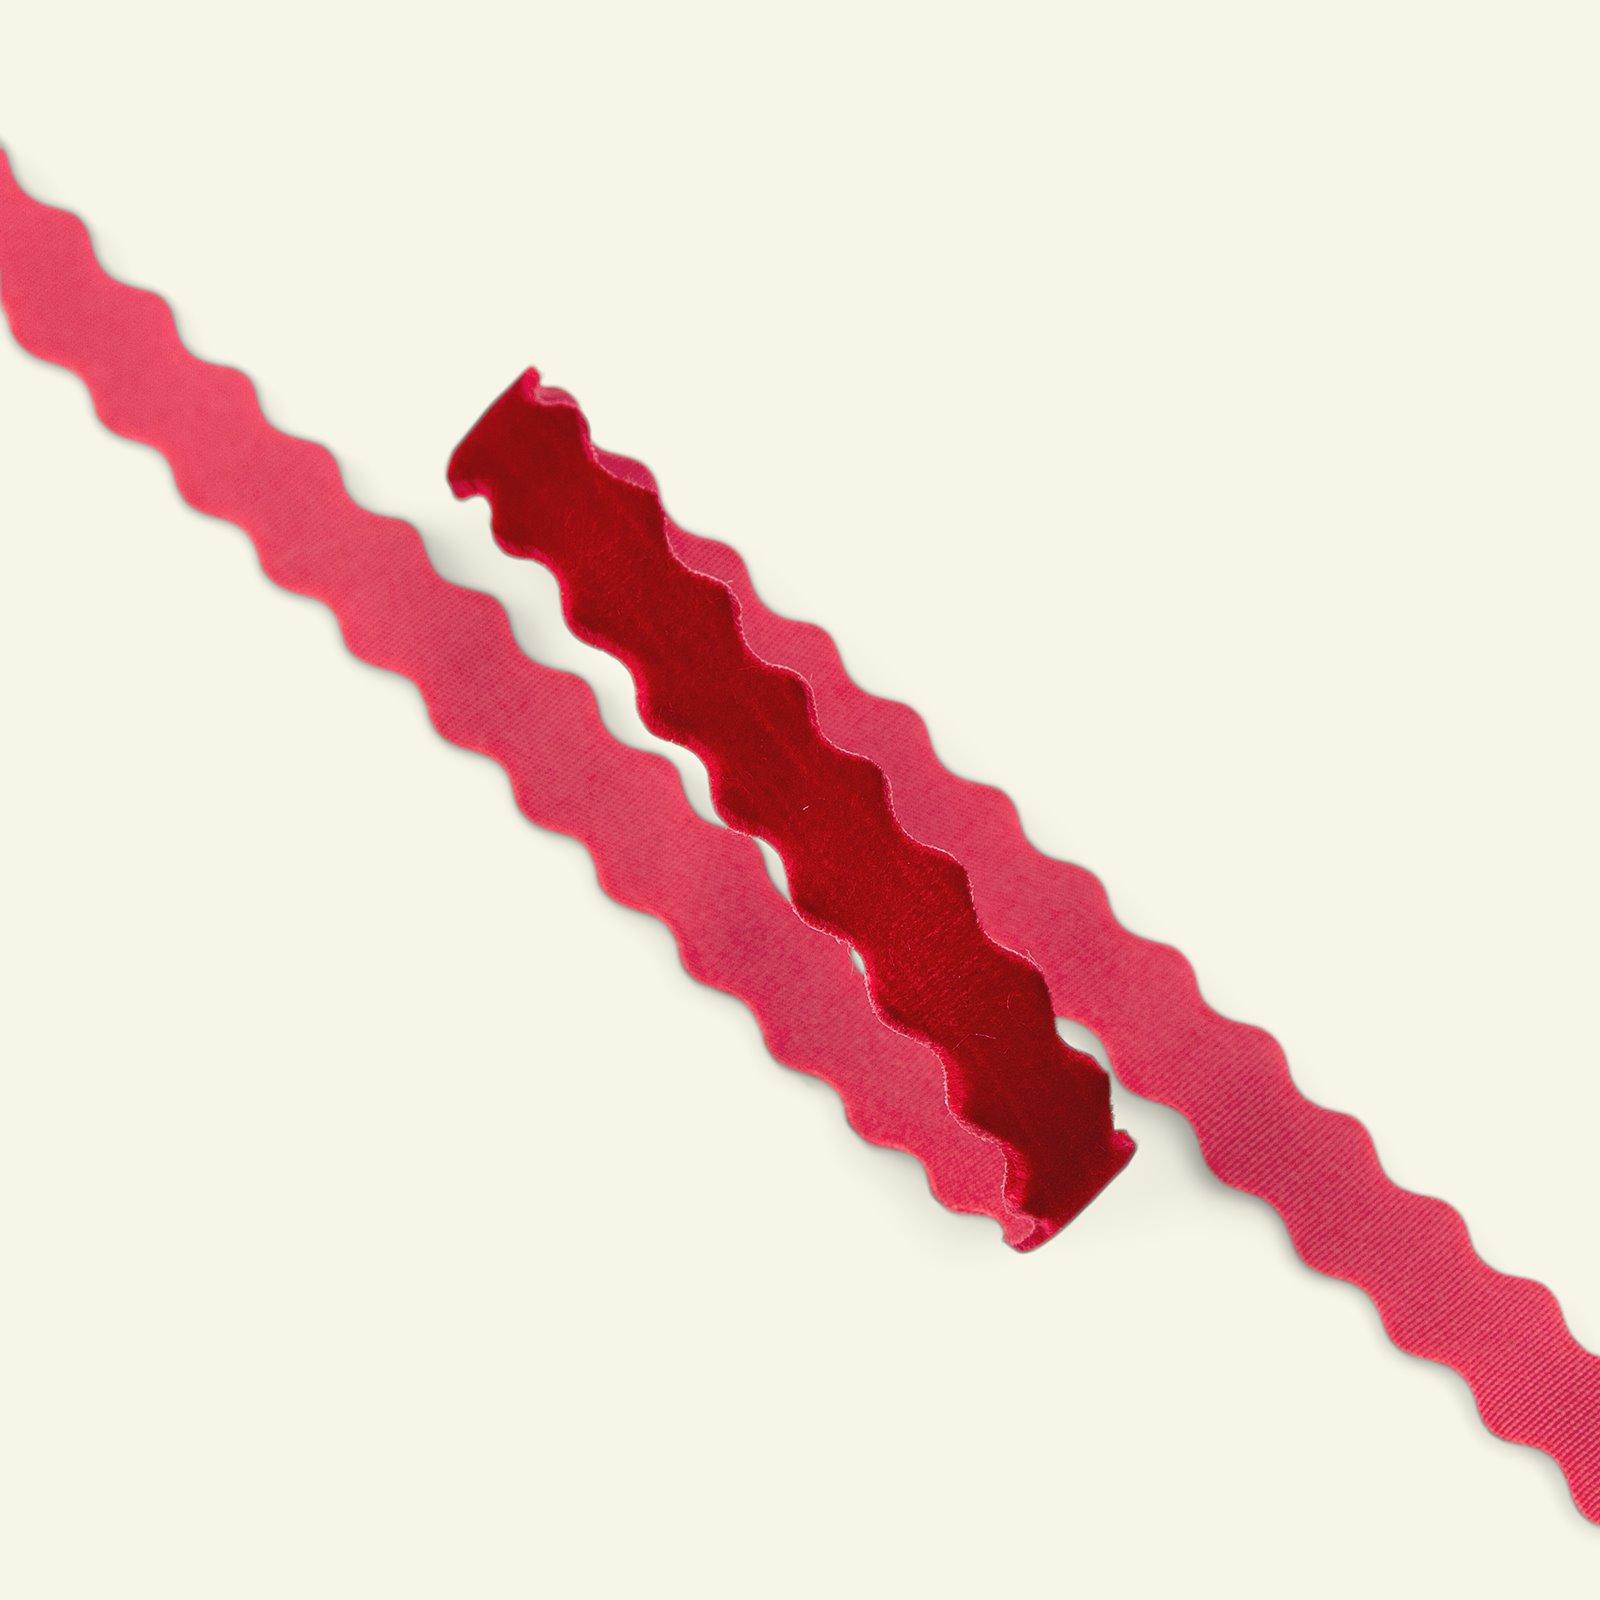 Zackenlitze velour, 10mm Rot, 2 m 22213_pack